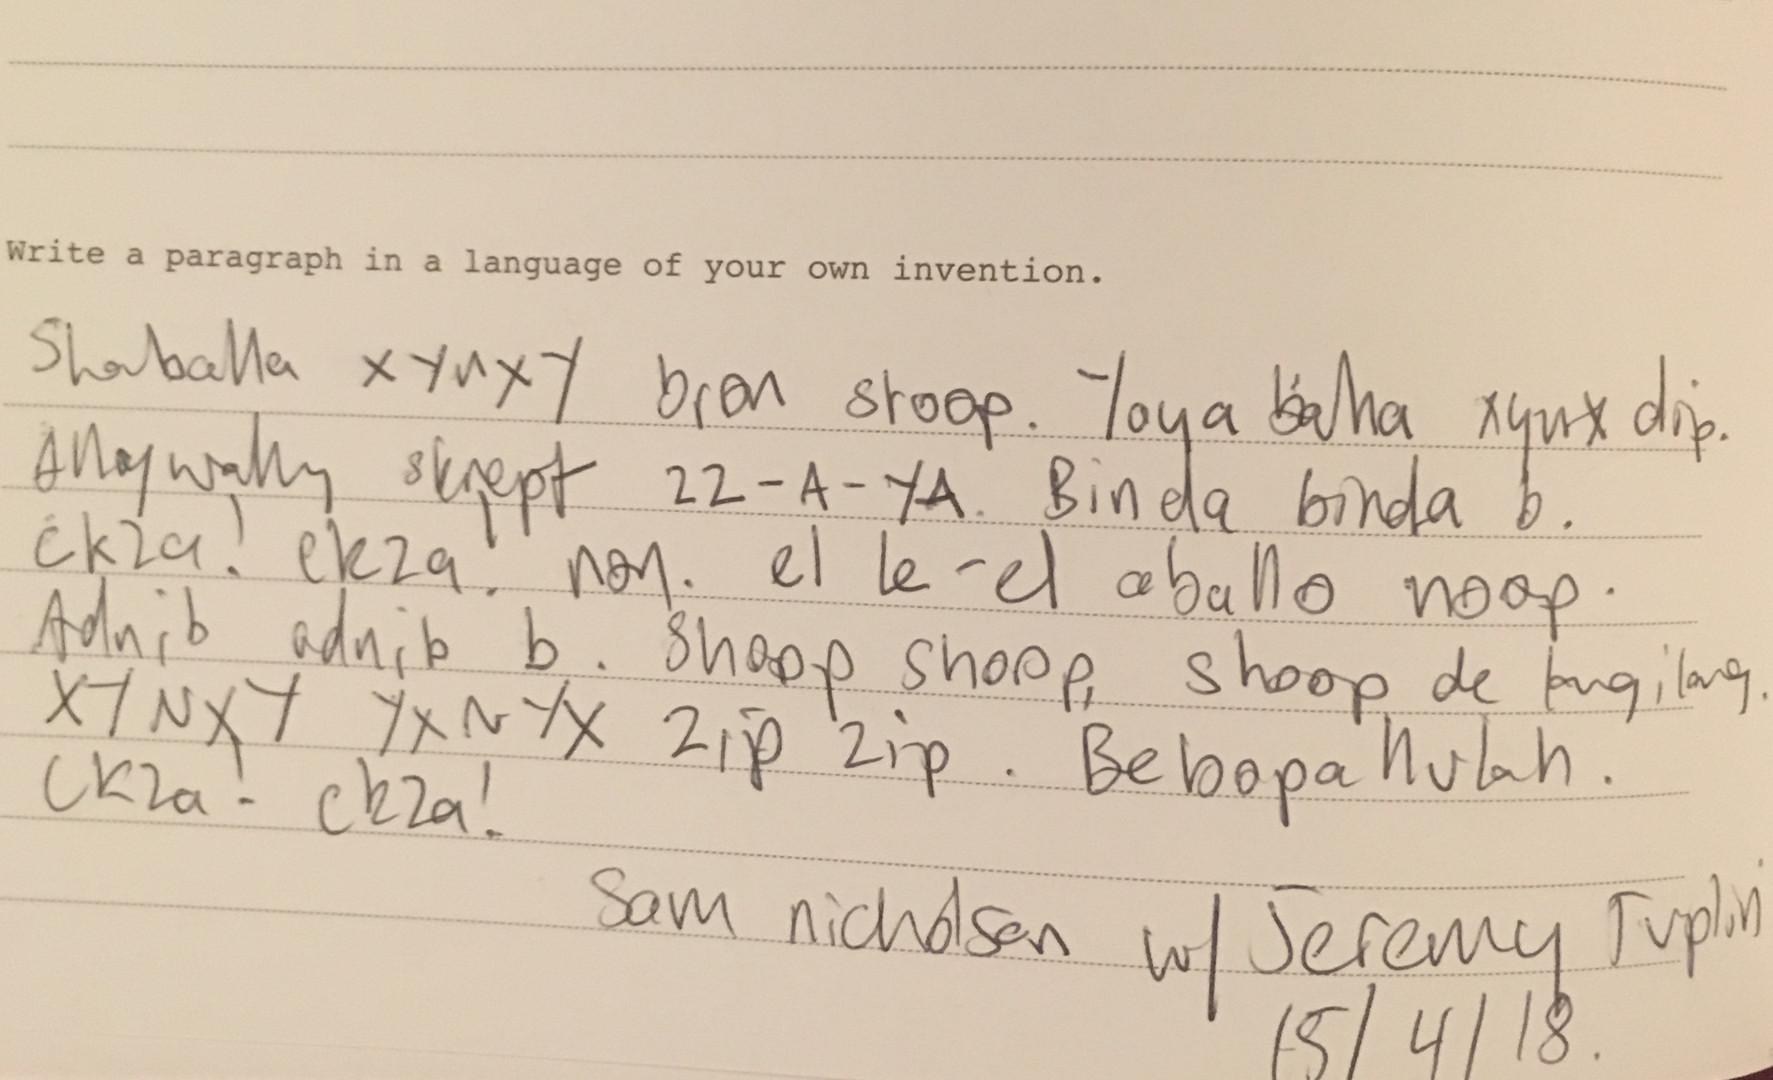 Visitor Book - Sam Nicholson